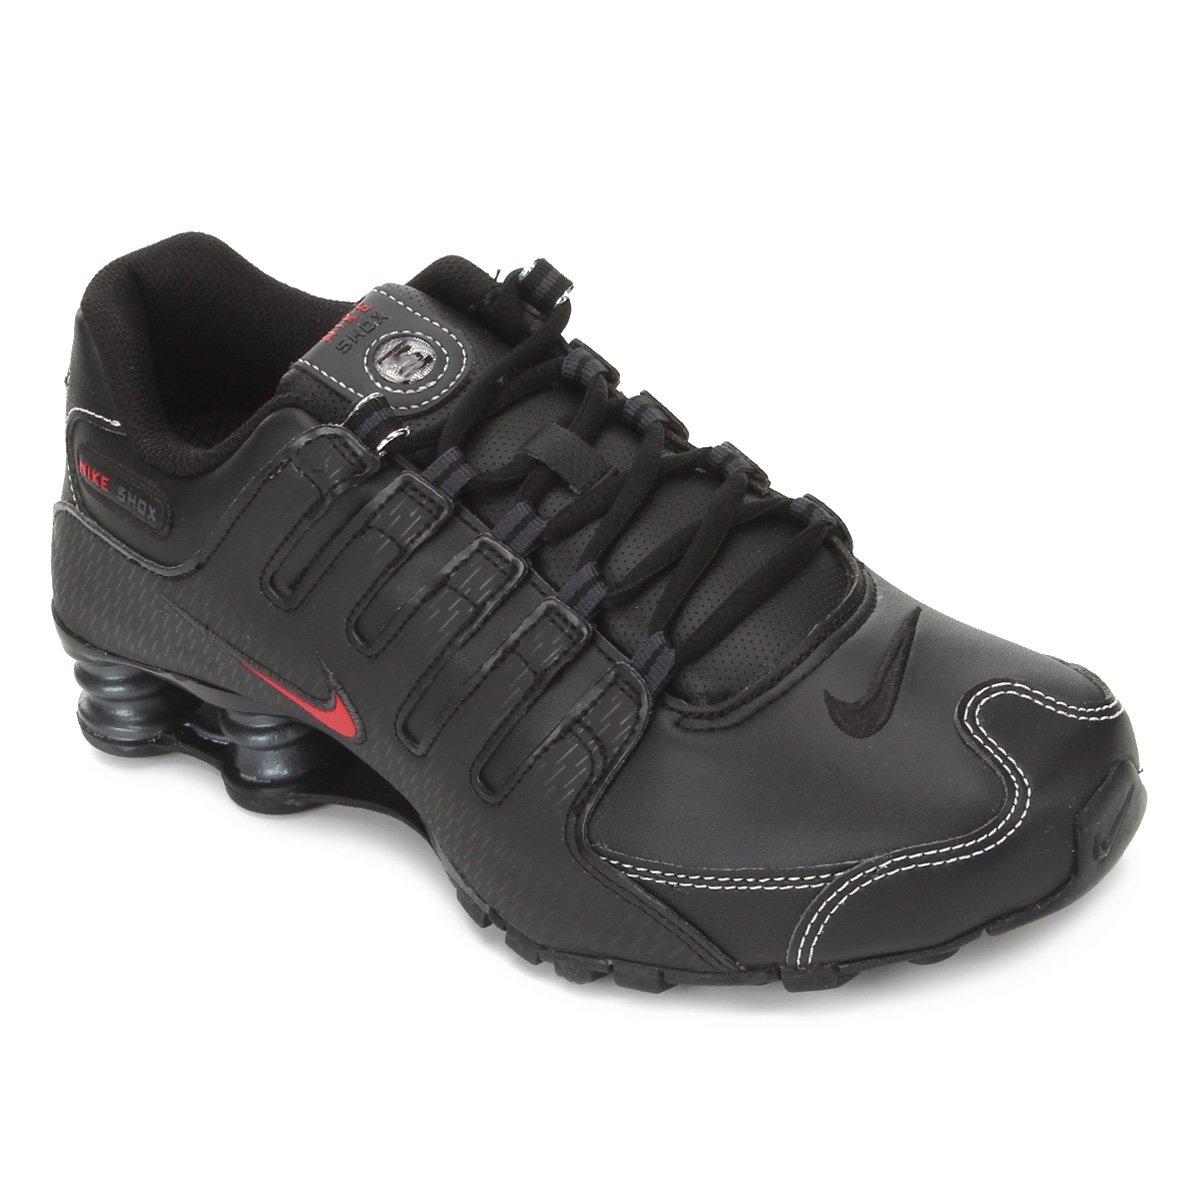 Tênis Nike Shox Nz Masculino - Tam: 42